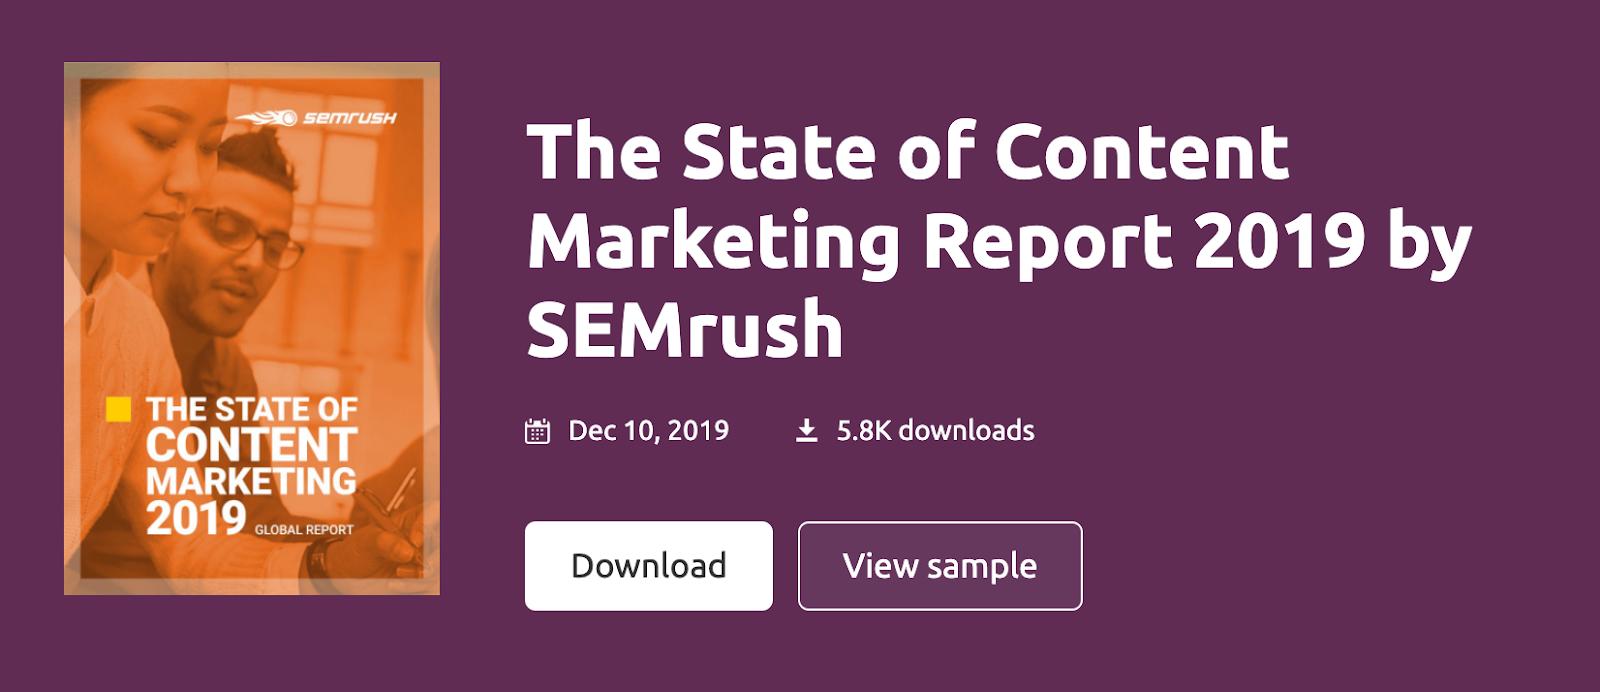 state of content marketing semrush